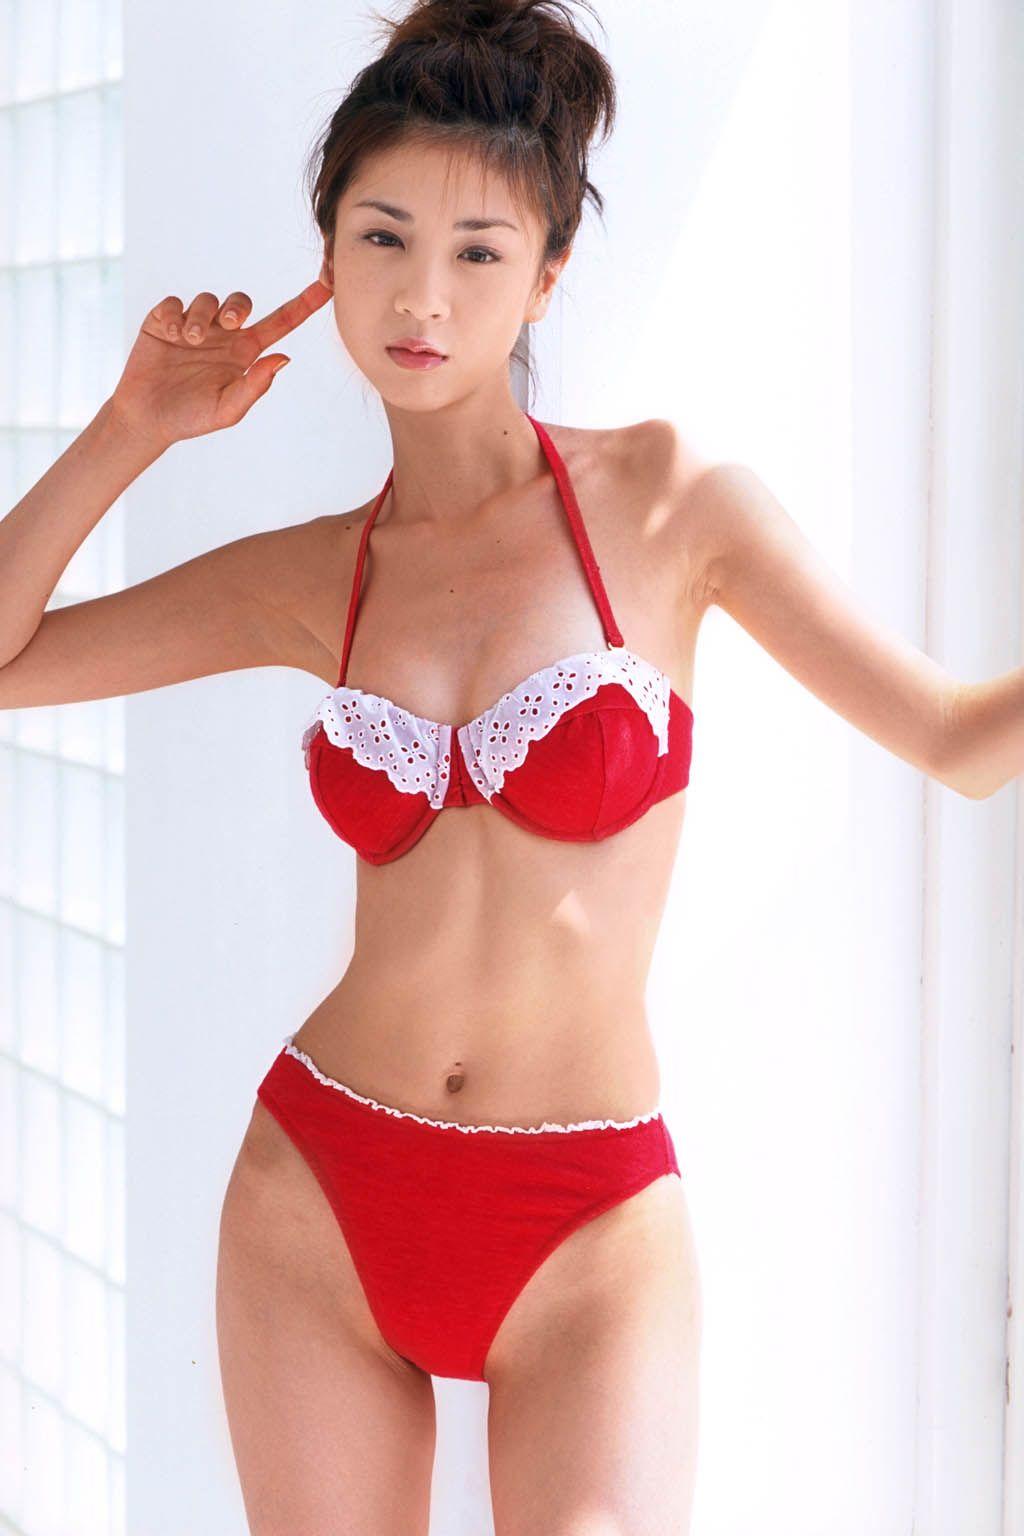 ✿ aki hoshino • 星野亚希 | 東洋人 | pinterest